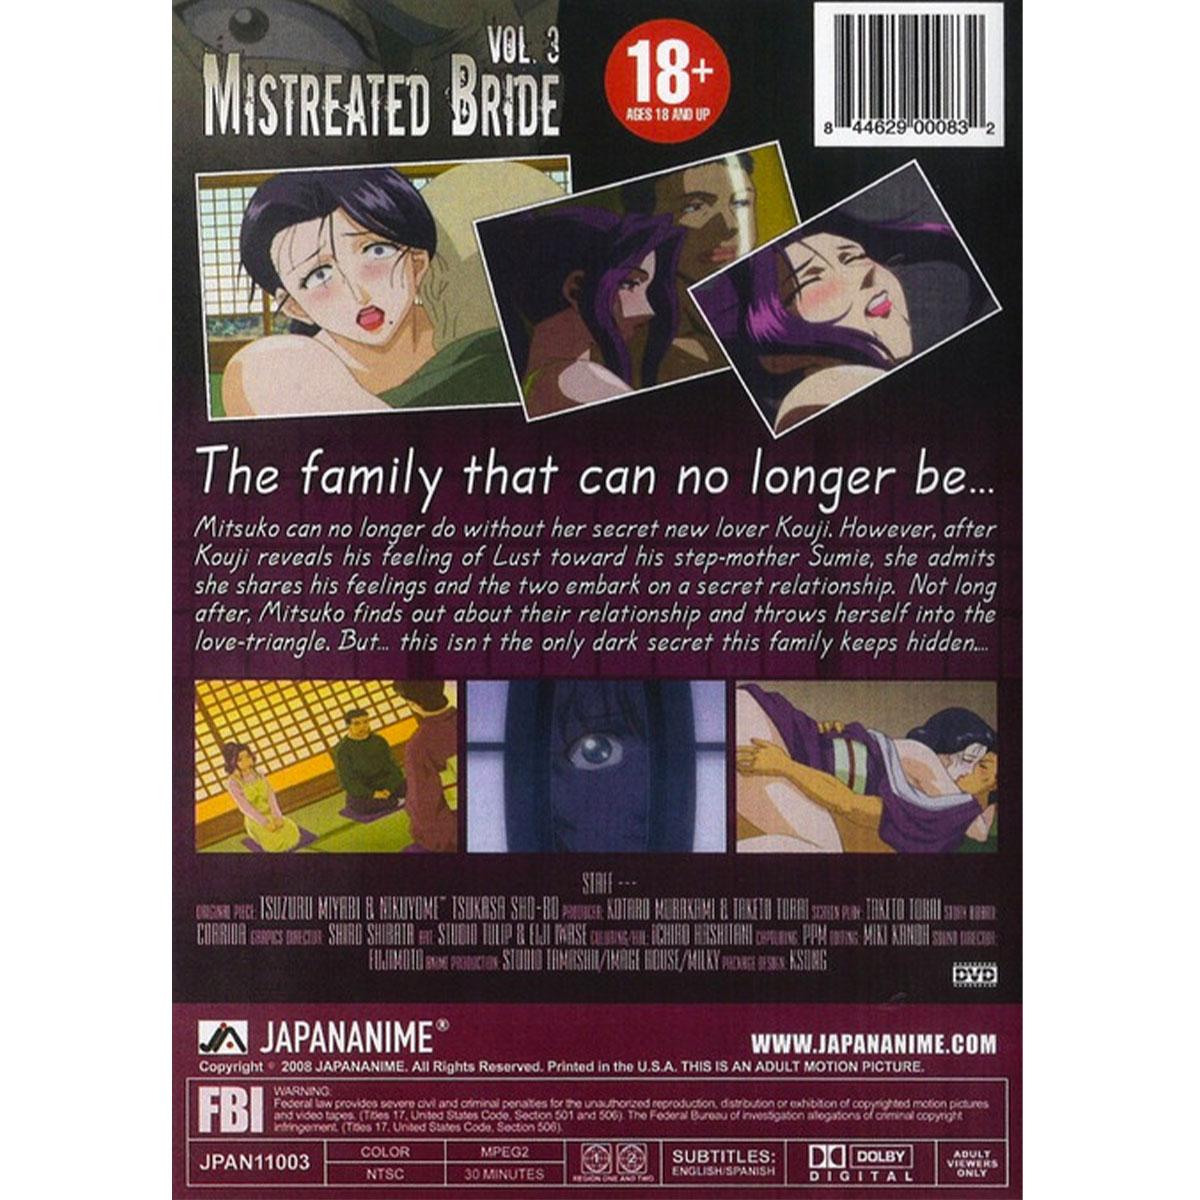 Mistreated Bride DVD 3